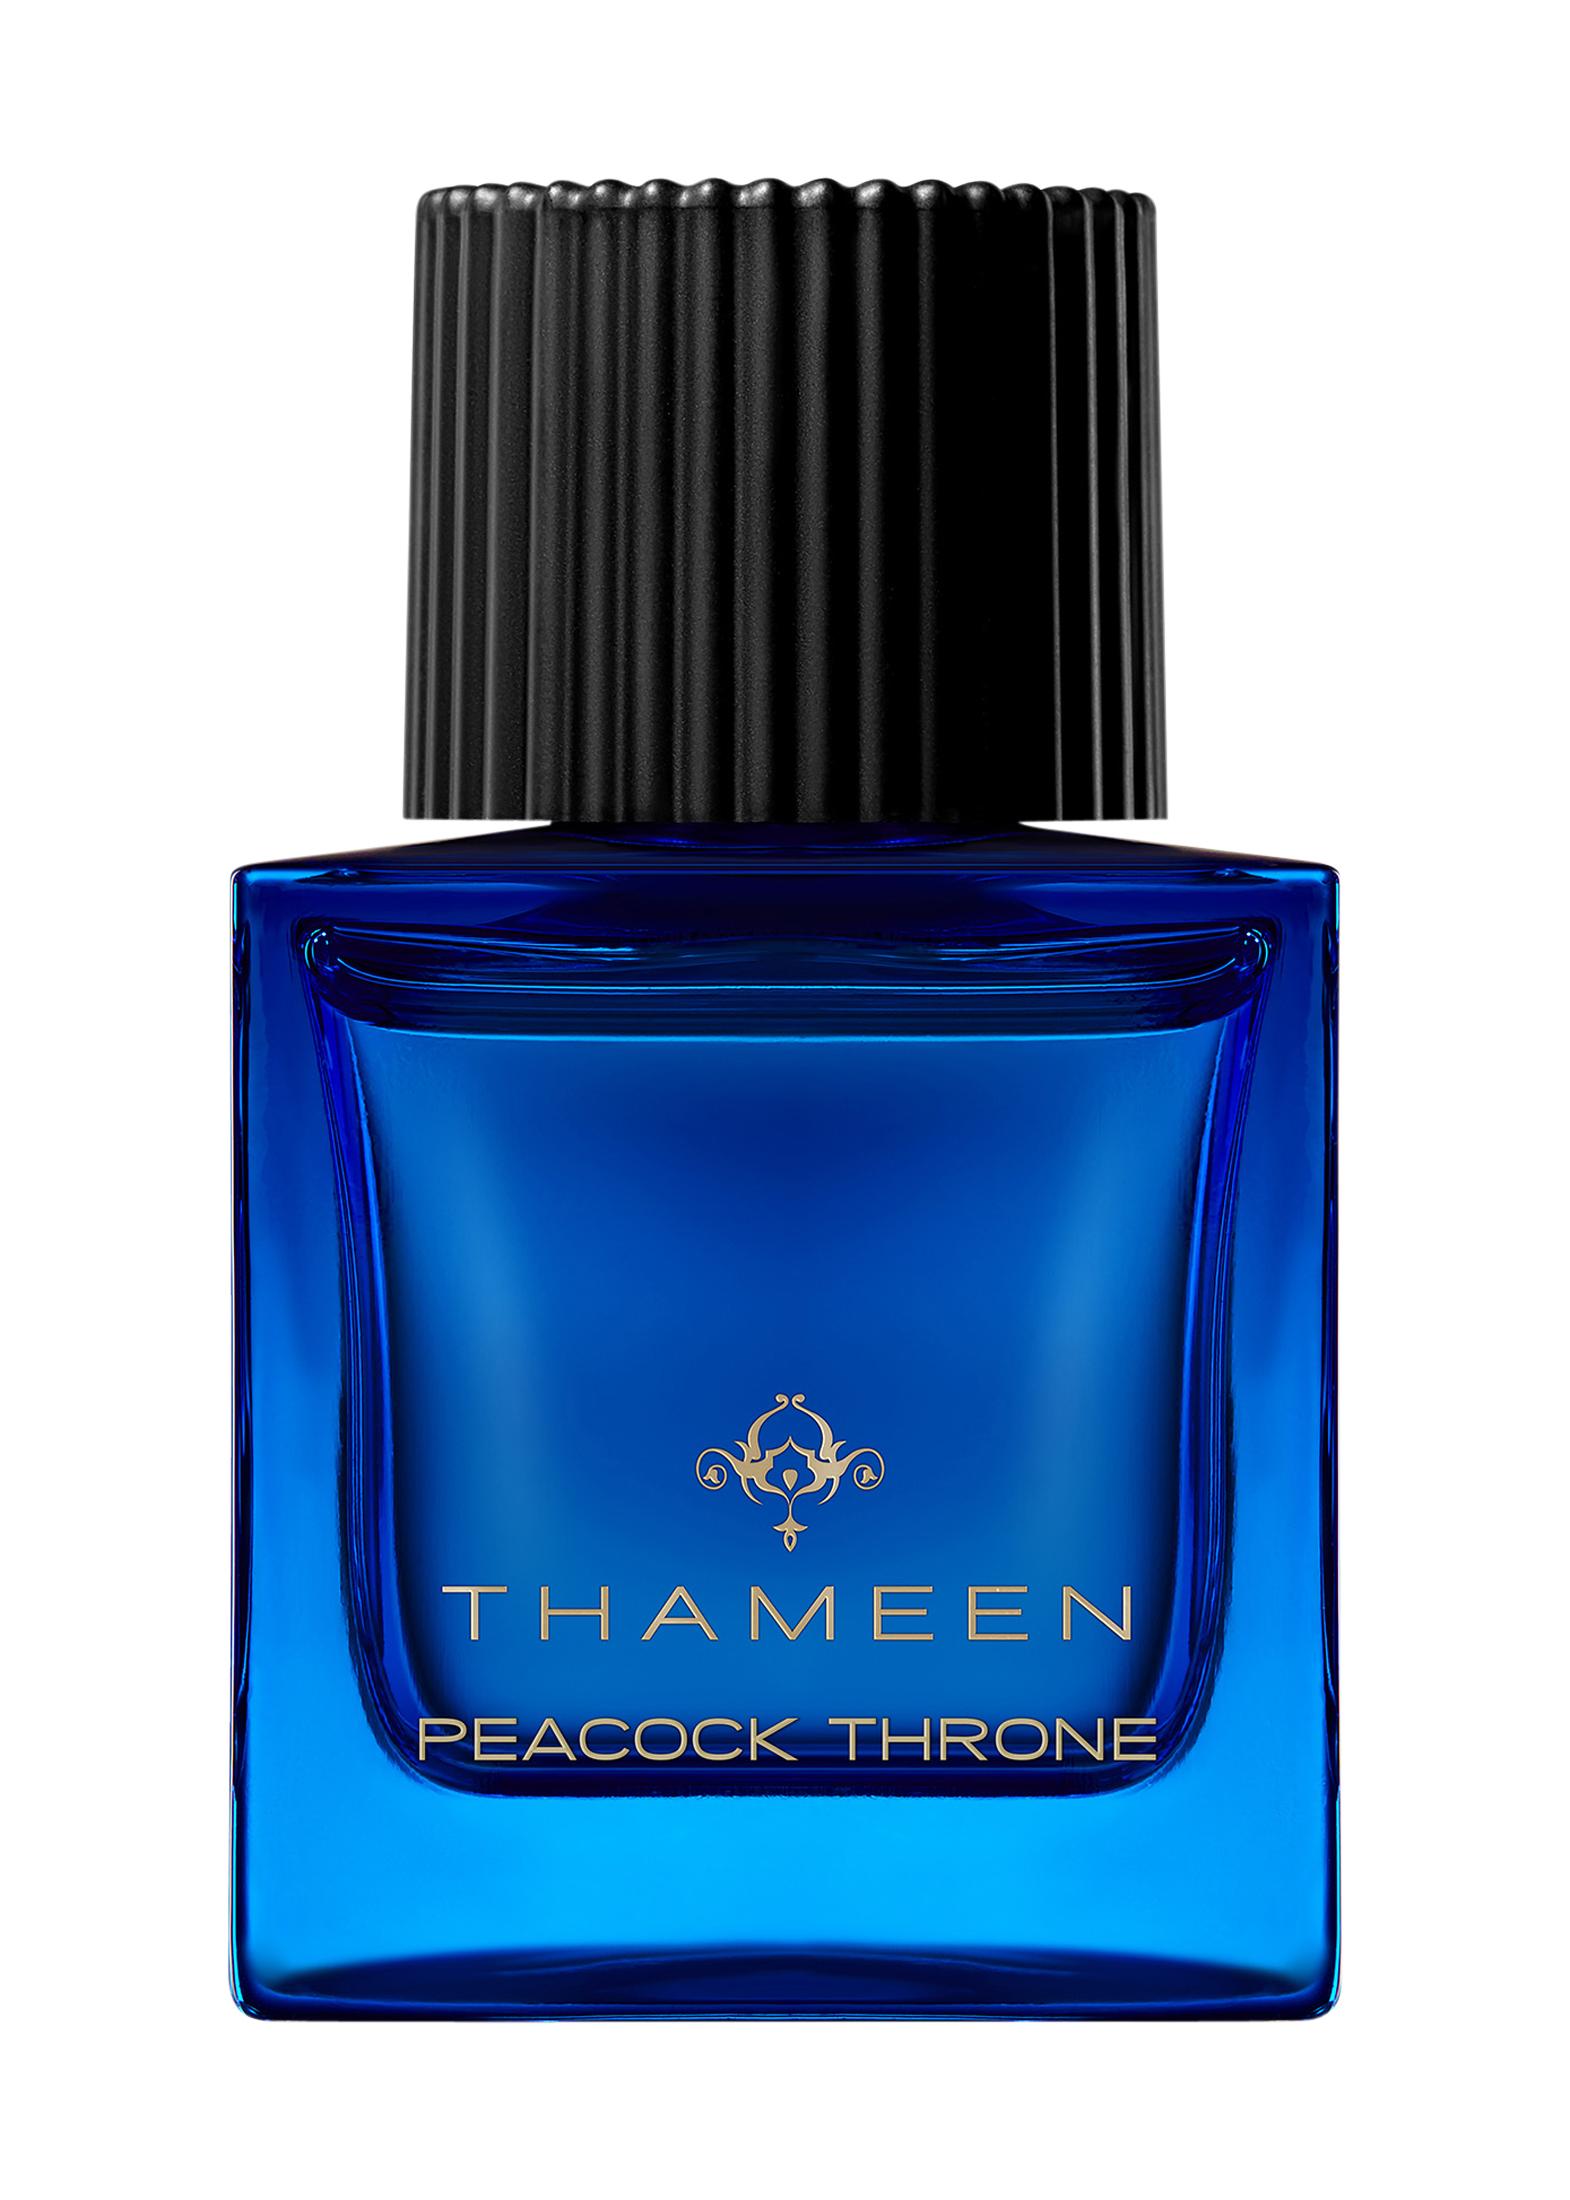 Peacock Throne Eau De Parfum 50ml image number 0